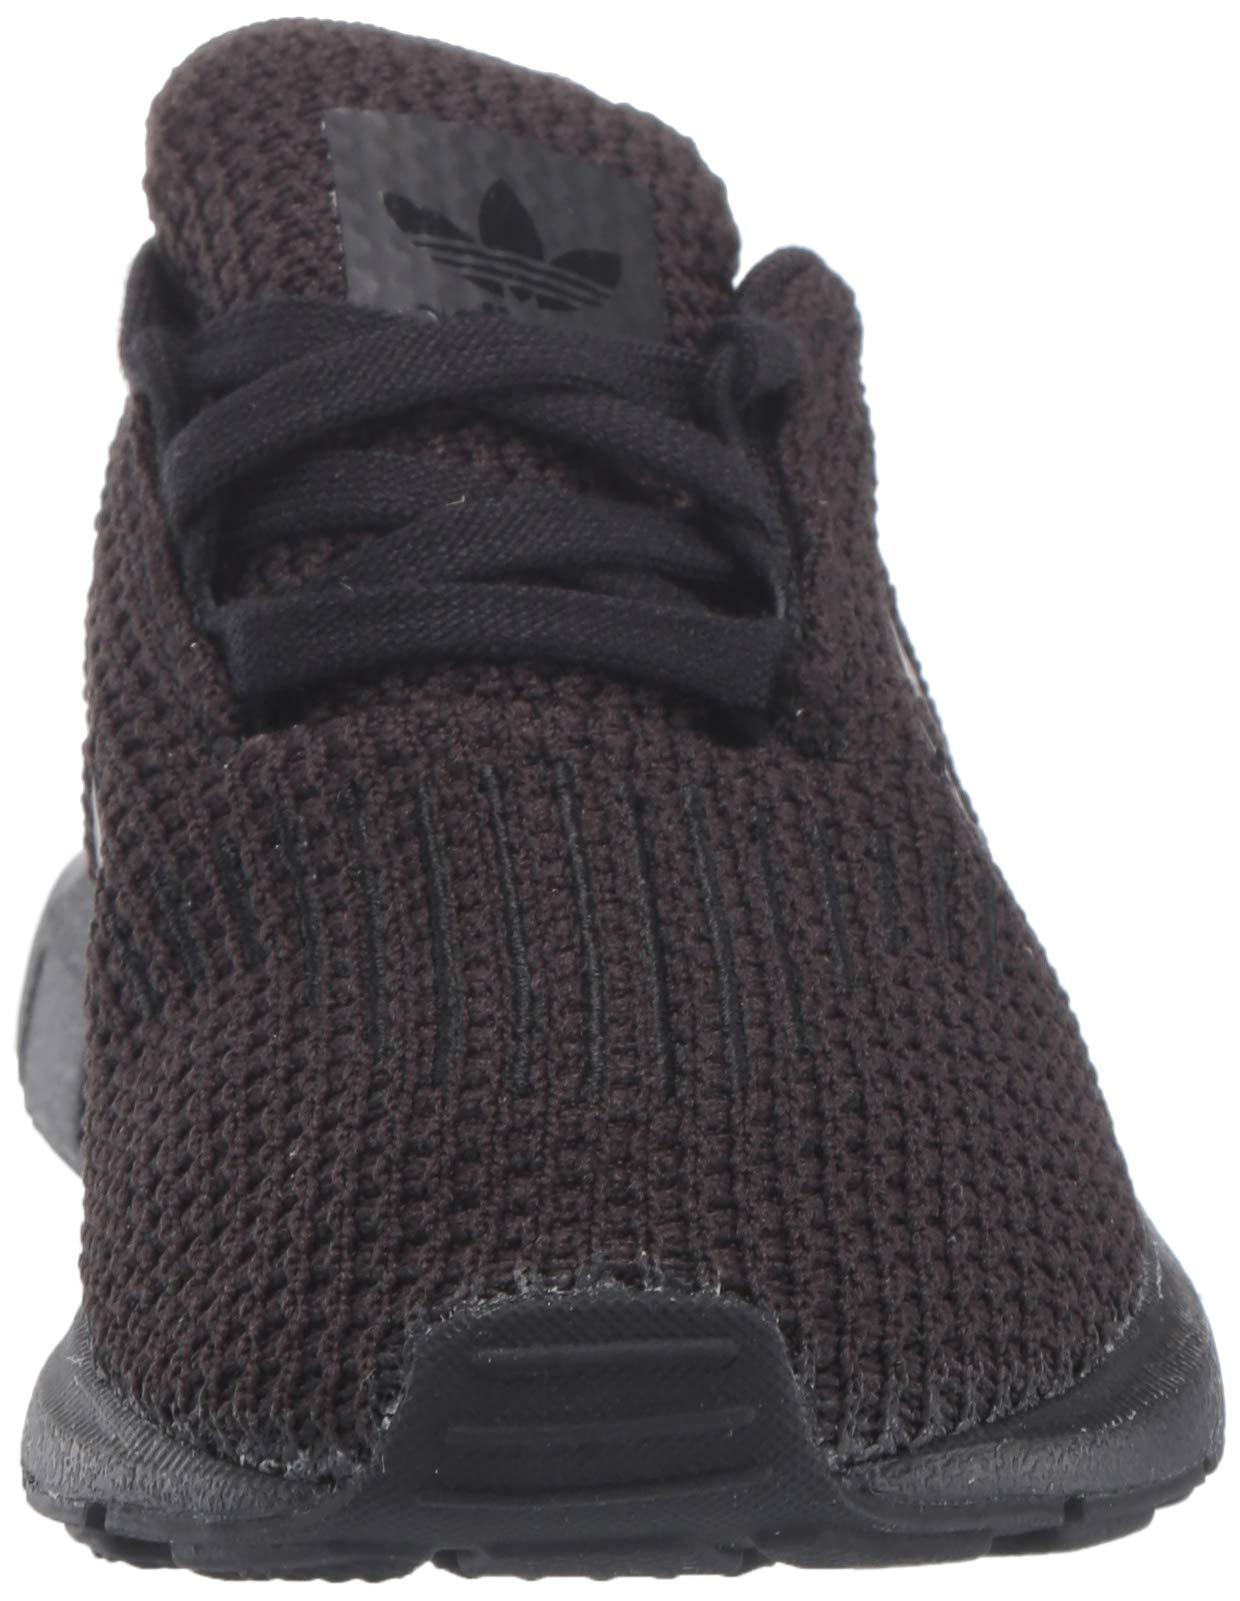 adidas Originals Baby Swift Running Shoe, Black, 5K M US Toddler by adidas Originals (Image #4)